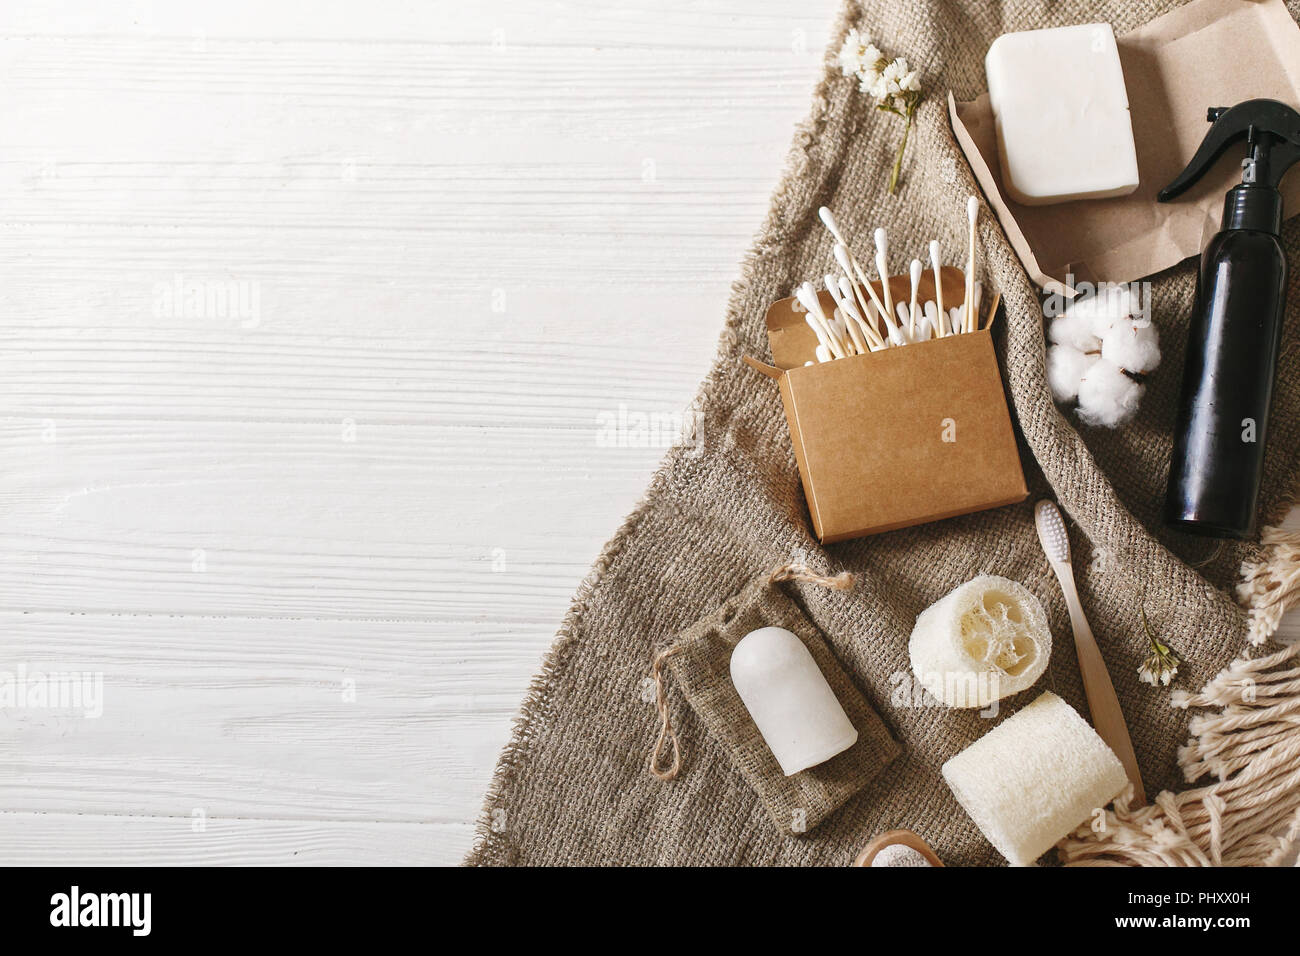 natural eco bamboo toothbrush, coconut soap, handmade